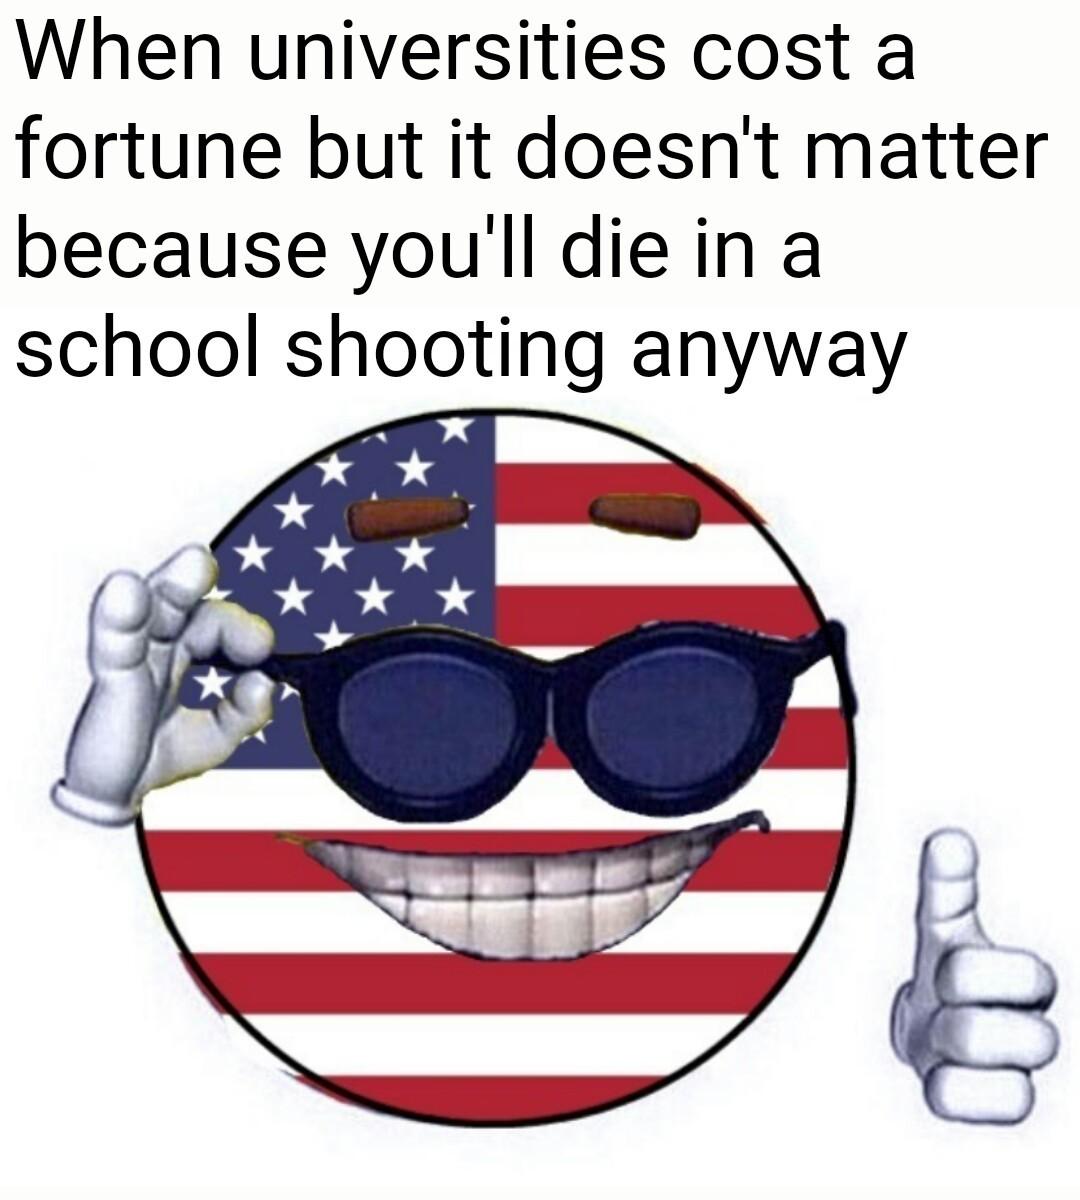 Anti us meme for ye